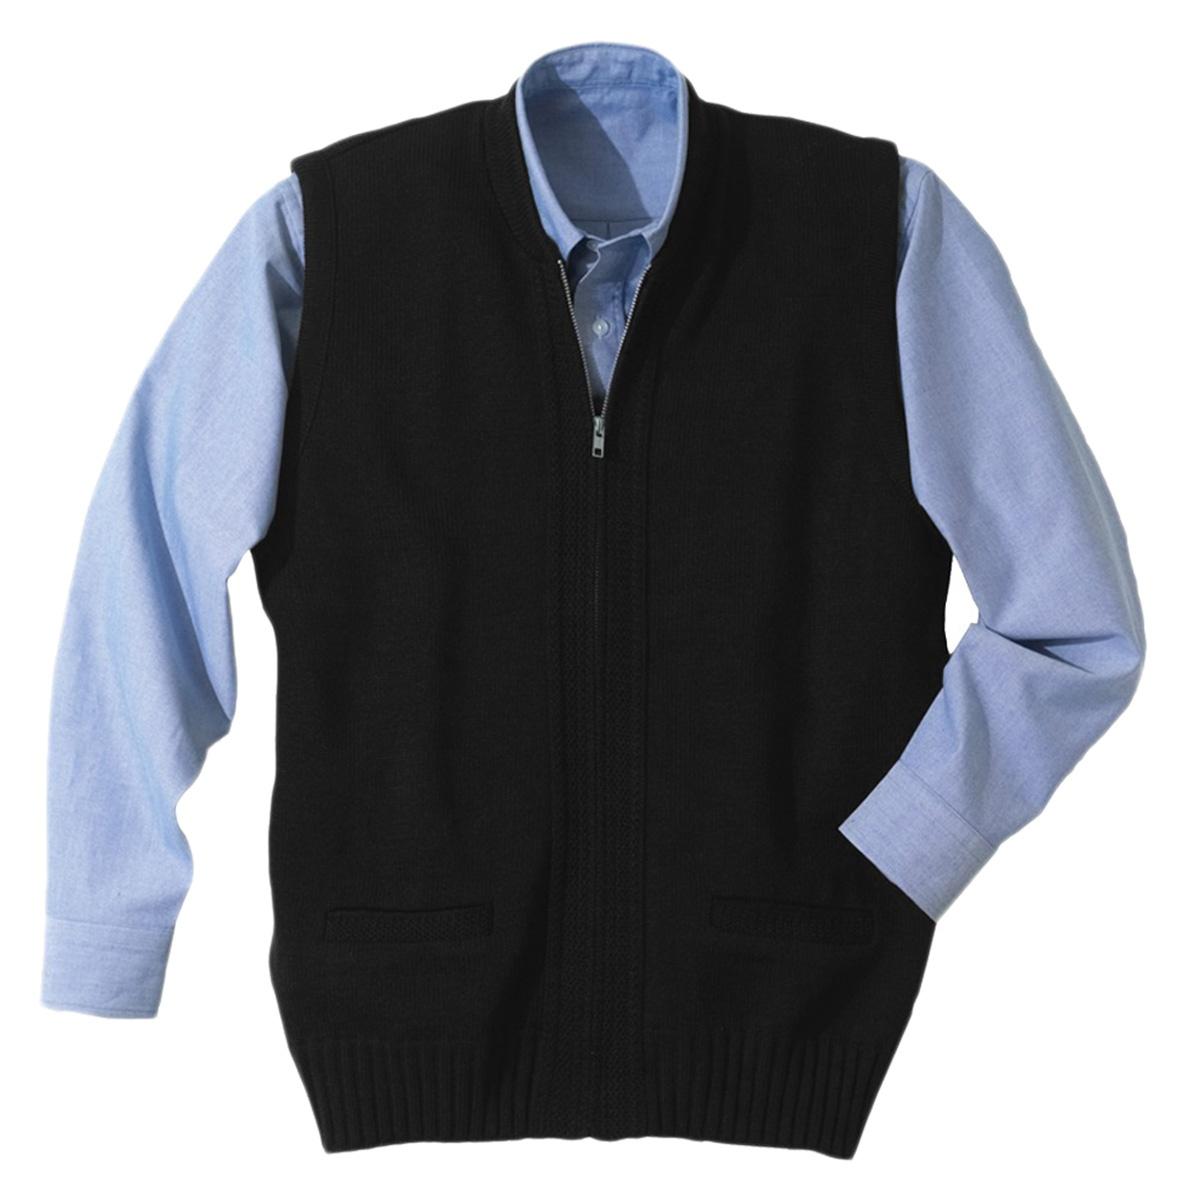 'Edwards 302 Full Zip Heavyweight Acrylic Sweater Vest'